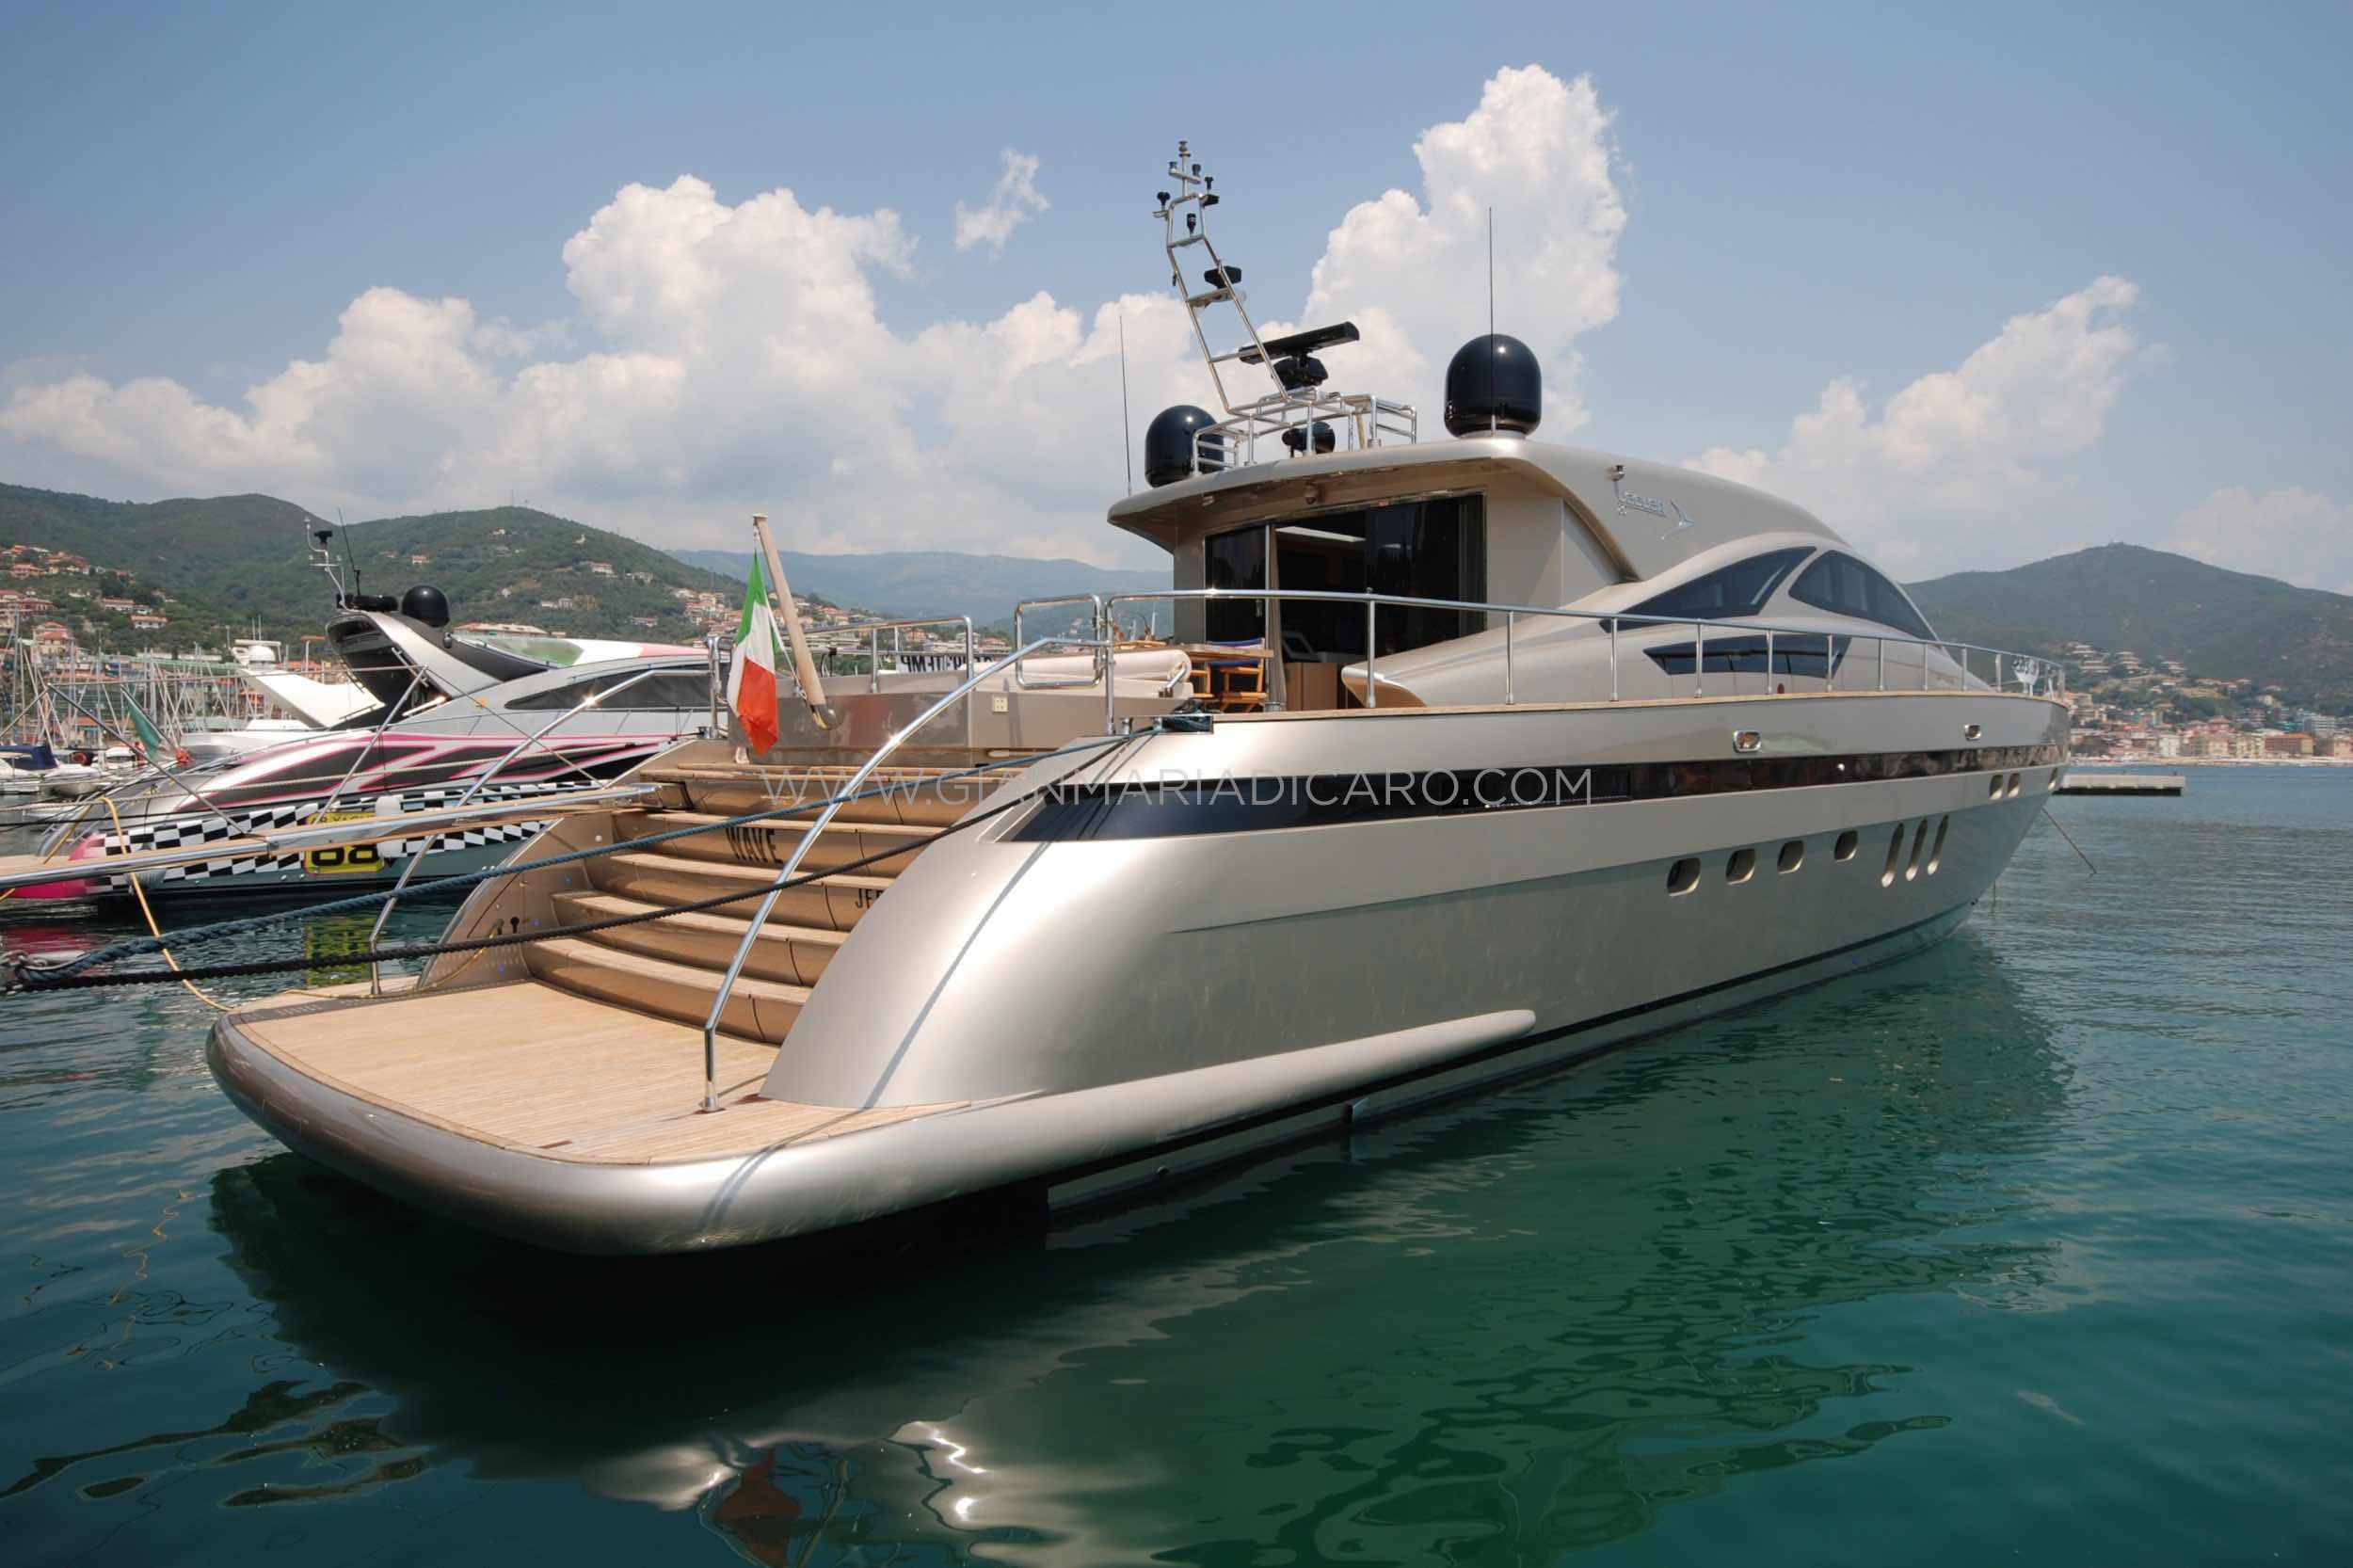 italian-yachts-jaguar-80-miss-11-for-sale-3.jpg